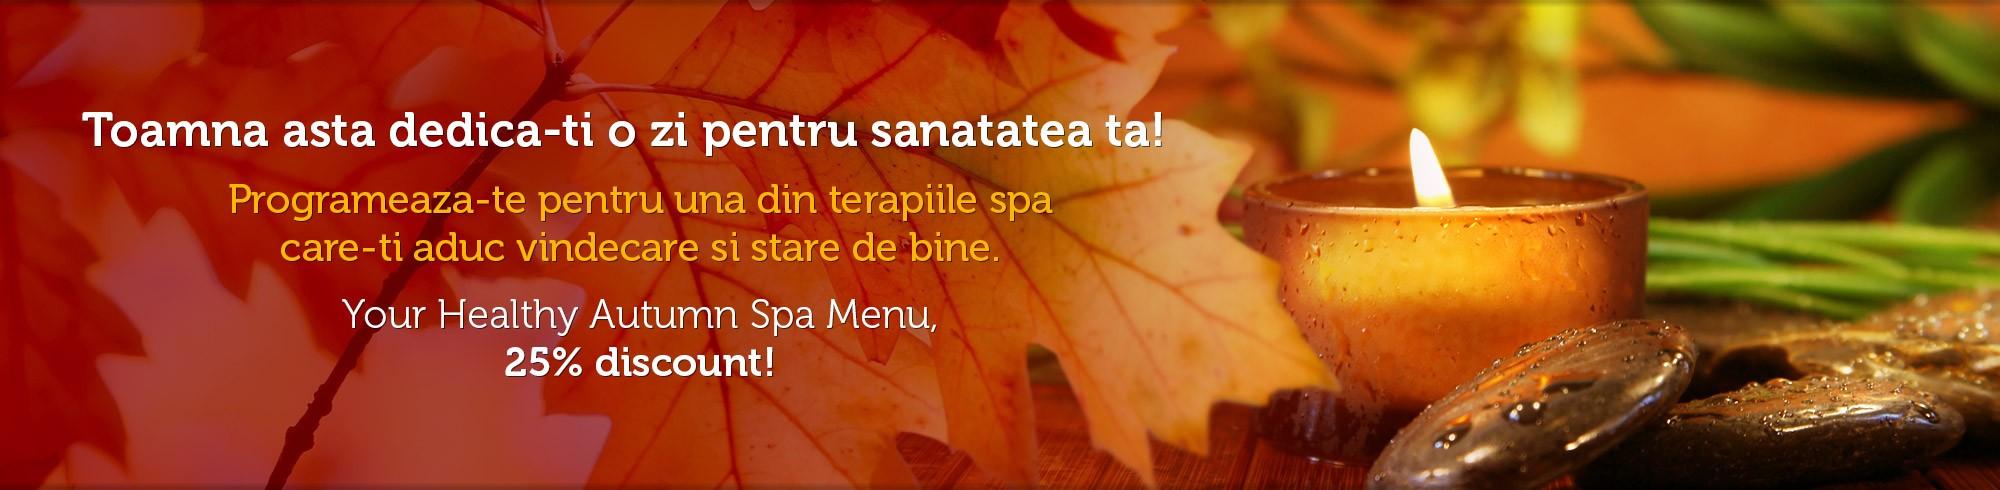 Healing Autumn Spa Menu